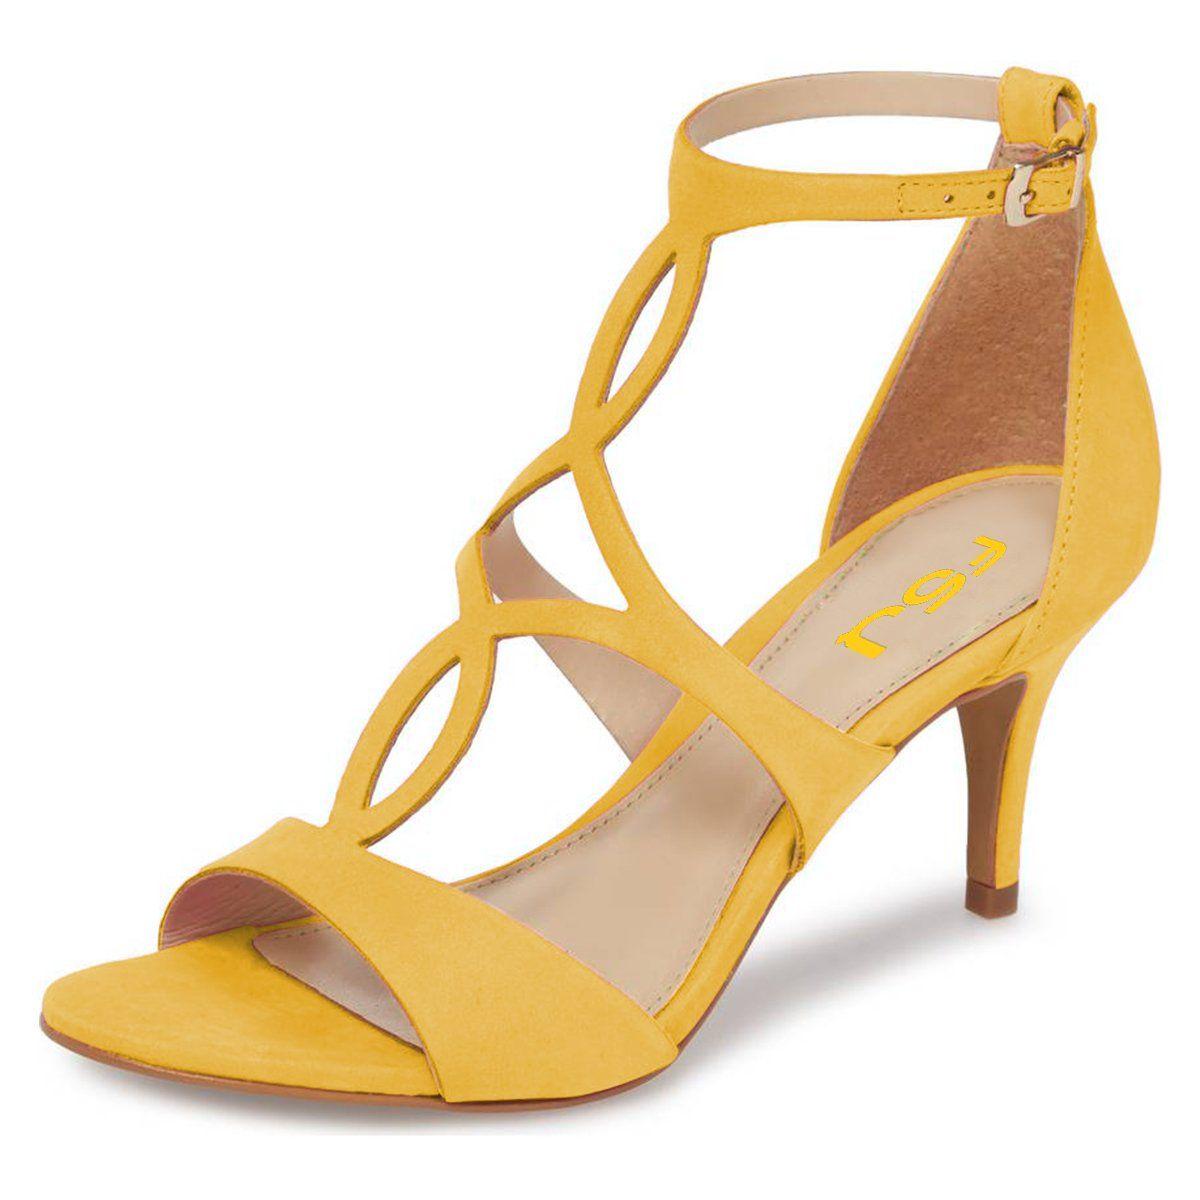 FSJ Women Fashion Ankle Strap Sandals Peep Toe Wedge High Heels Cutout Dress Shoes Size 4-15 US